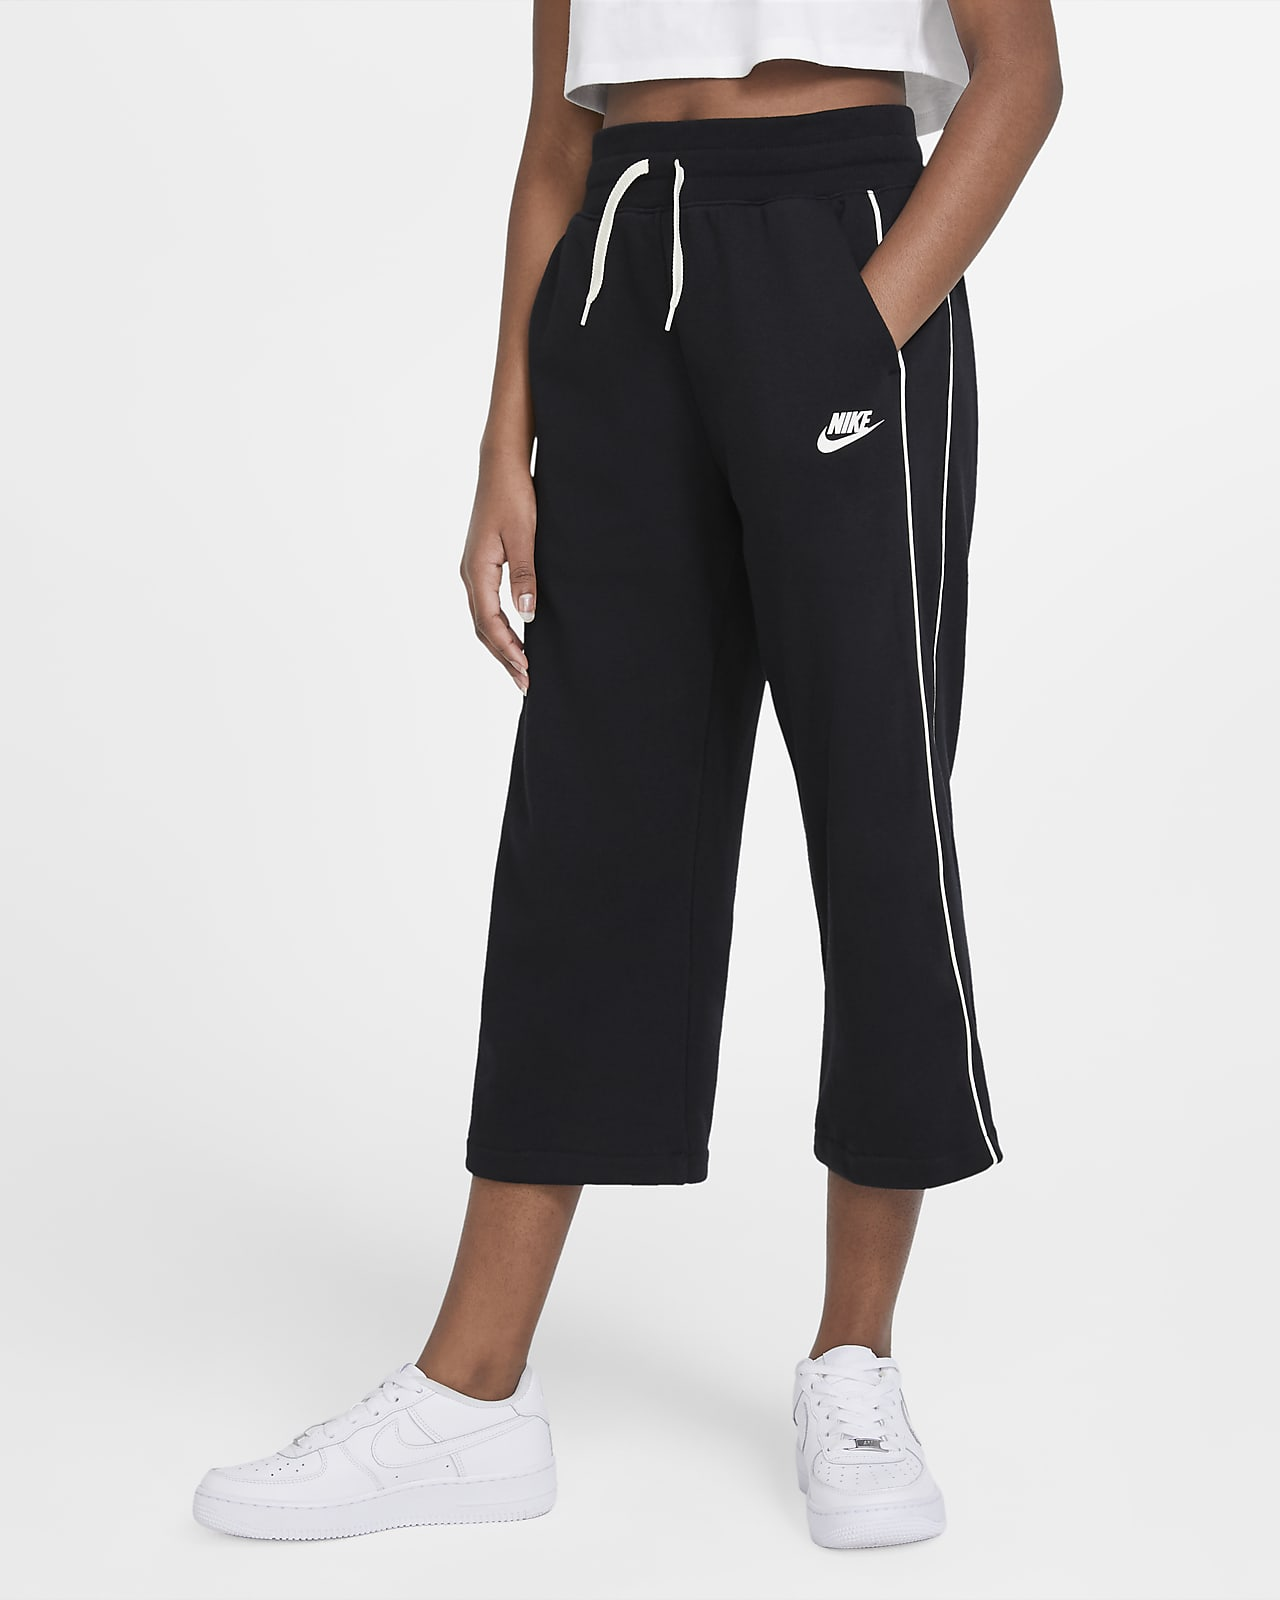 Брюки из ткани френч терри для девочек школьного возраста Nike Sportswear